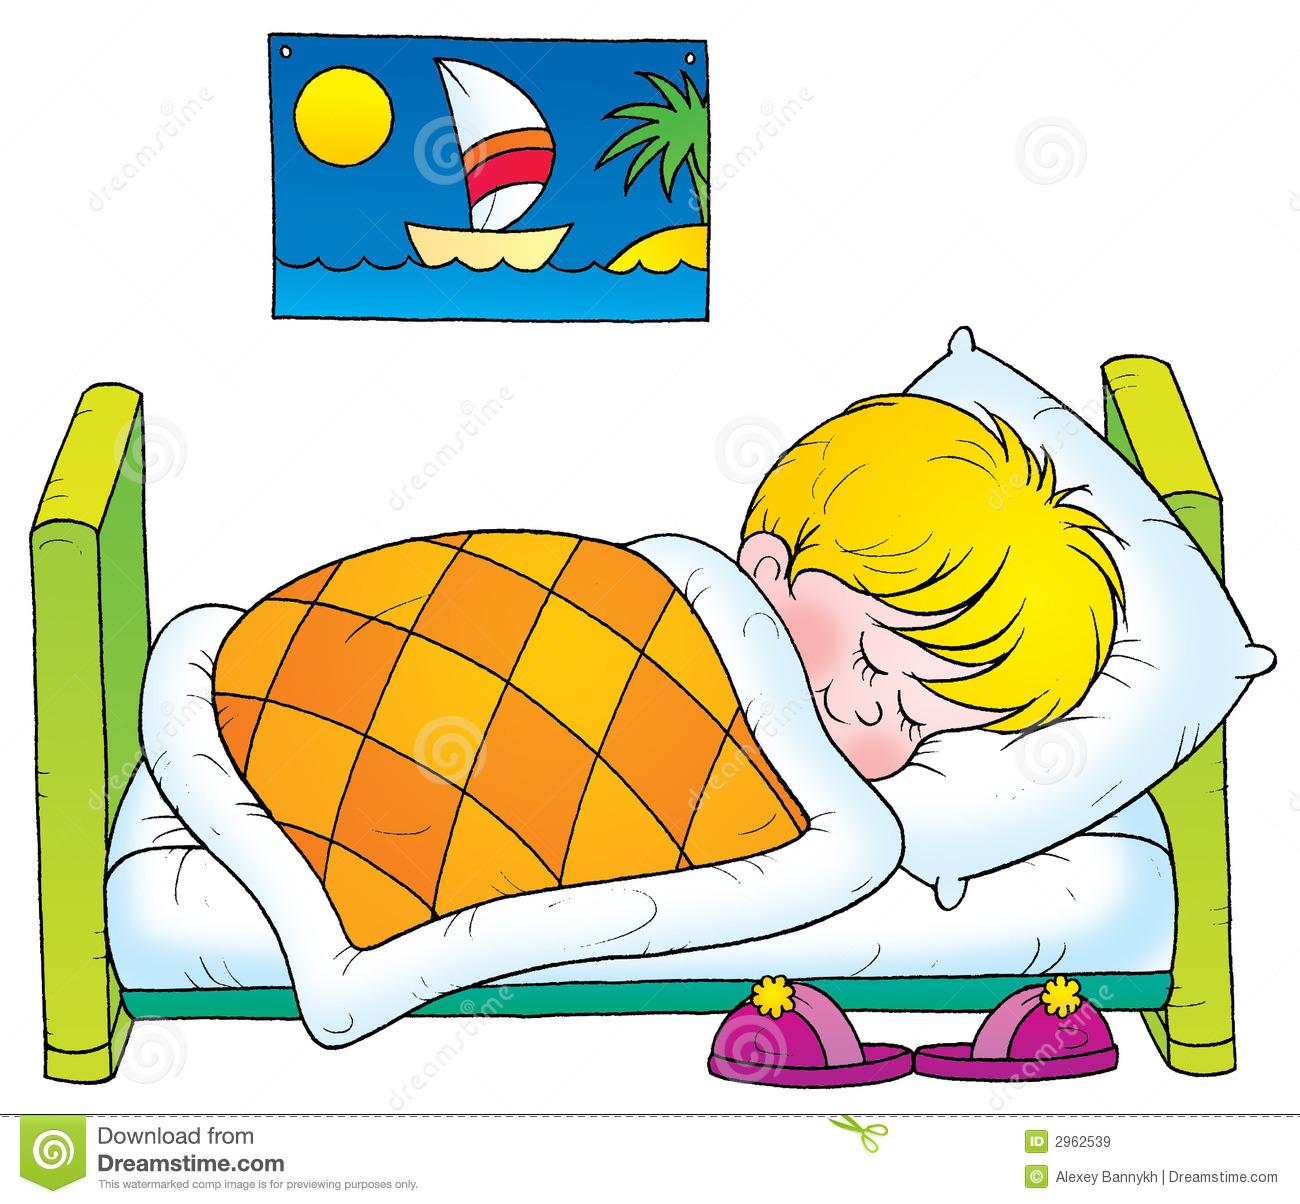 Blanket clipart child nap, Blanket child nap Transparent.